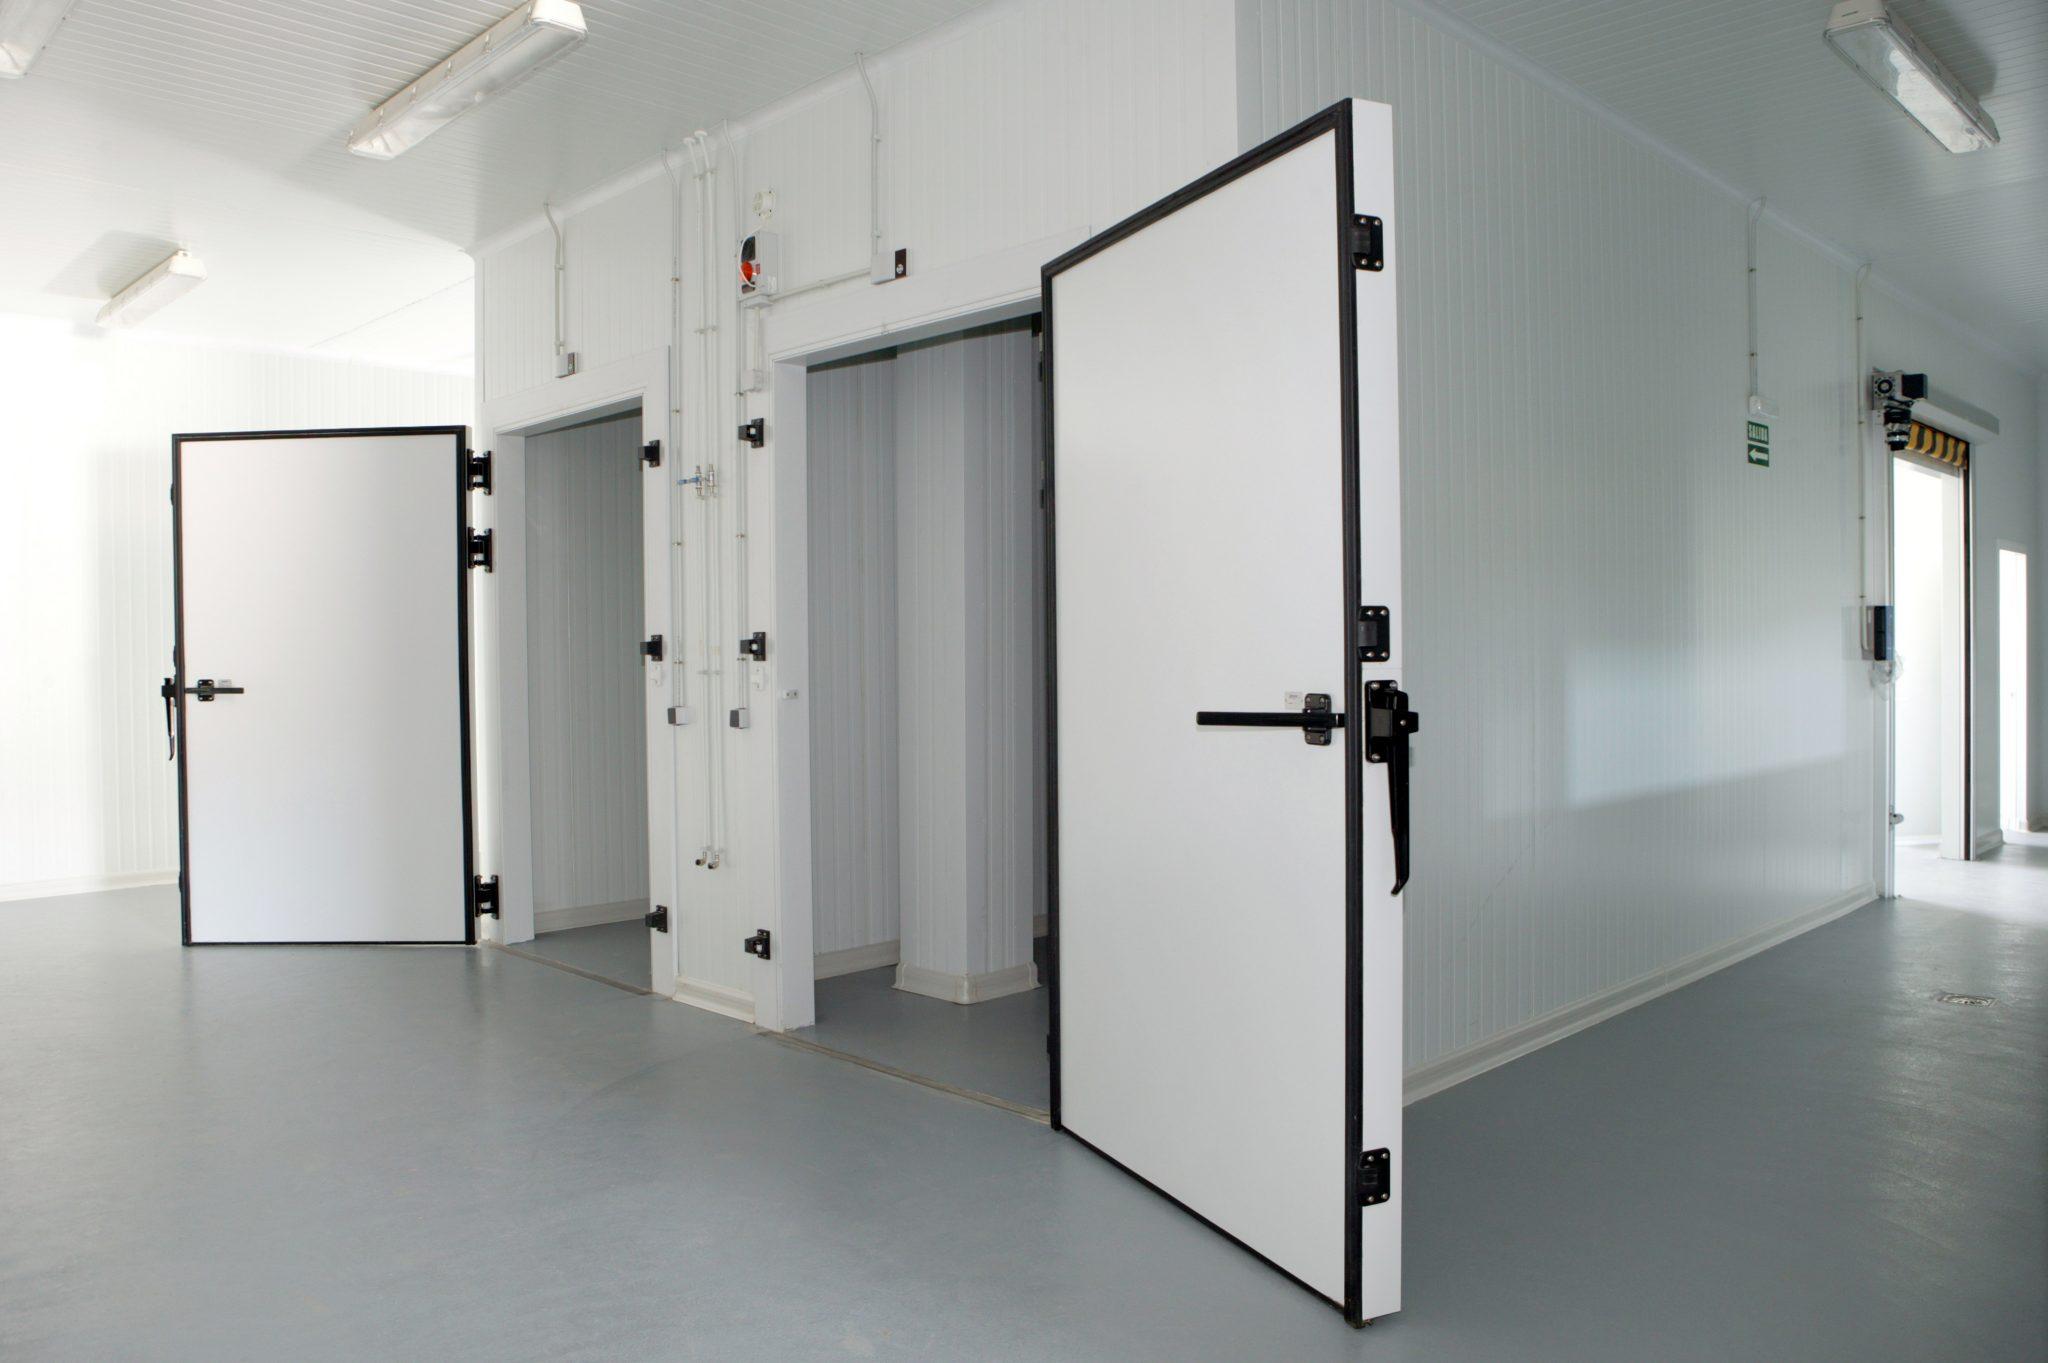 Industriële koel- en vriestechniek